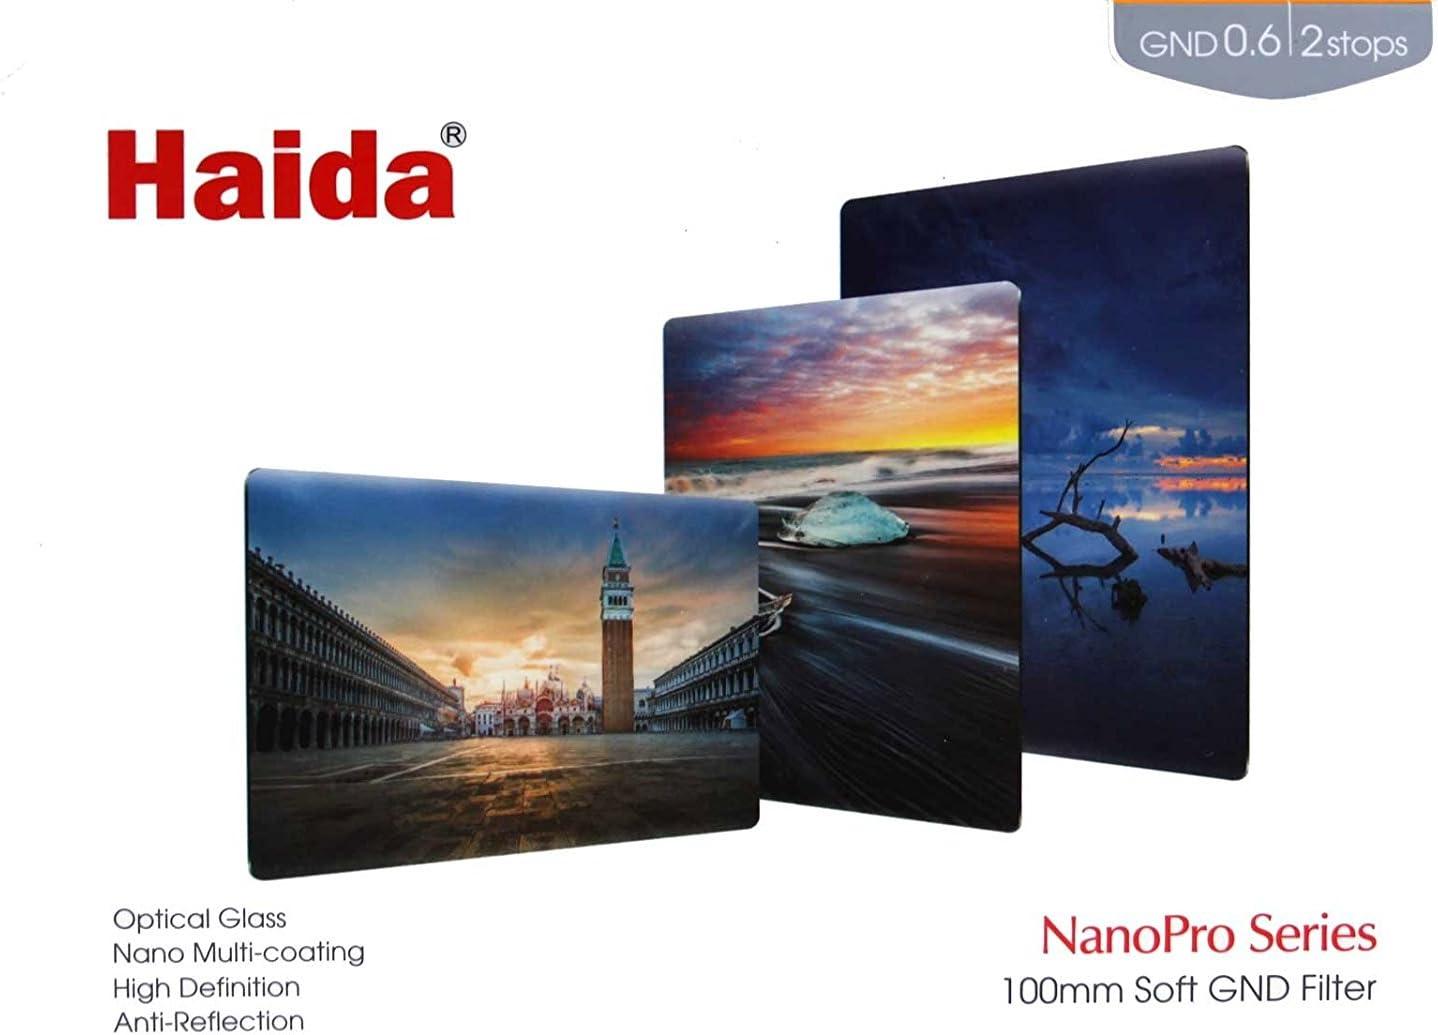 Haida NanoPro 100mm x 150mm MC Soft Grad ND 0.6 2 Stop Optical Glass Filter 100 ND4 Neutral Density HD3451